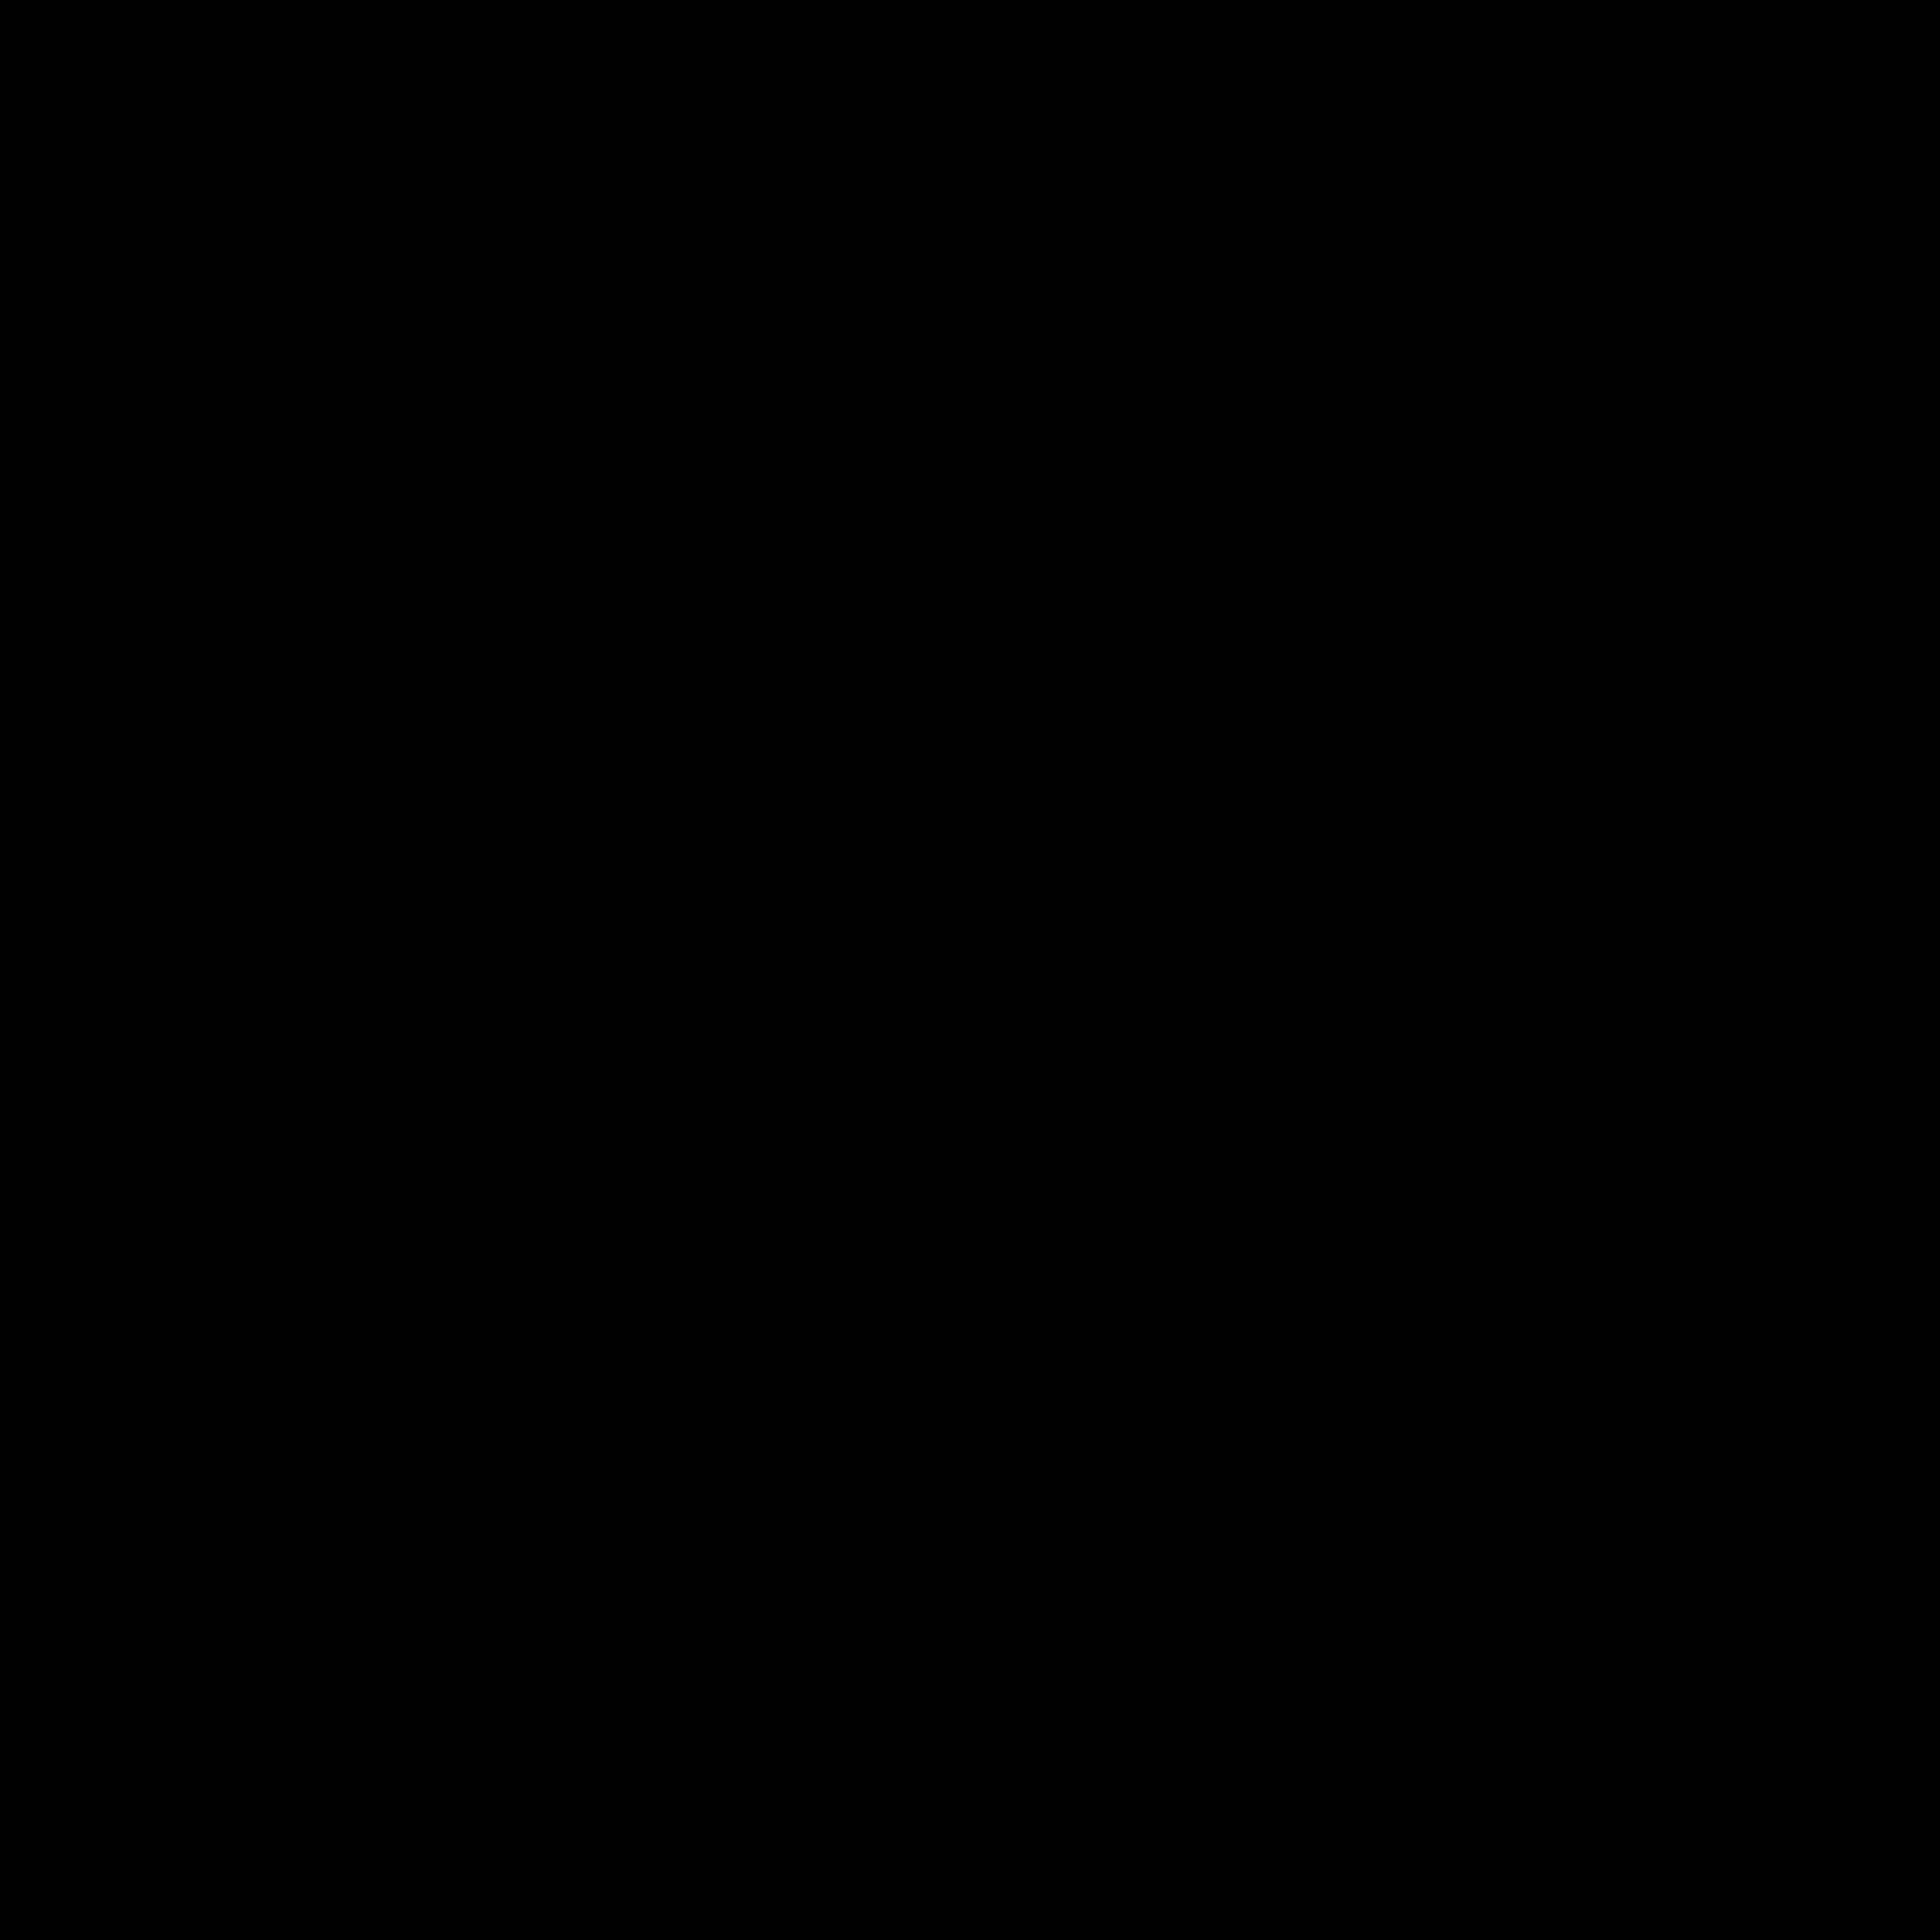 Clipart Triangle Tessellation Stroke